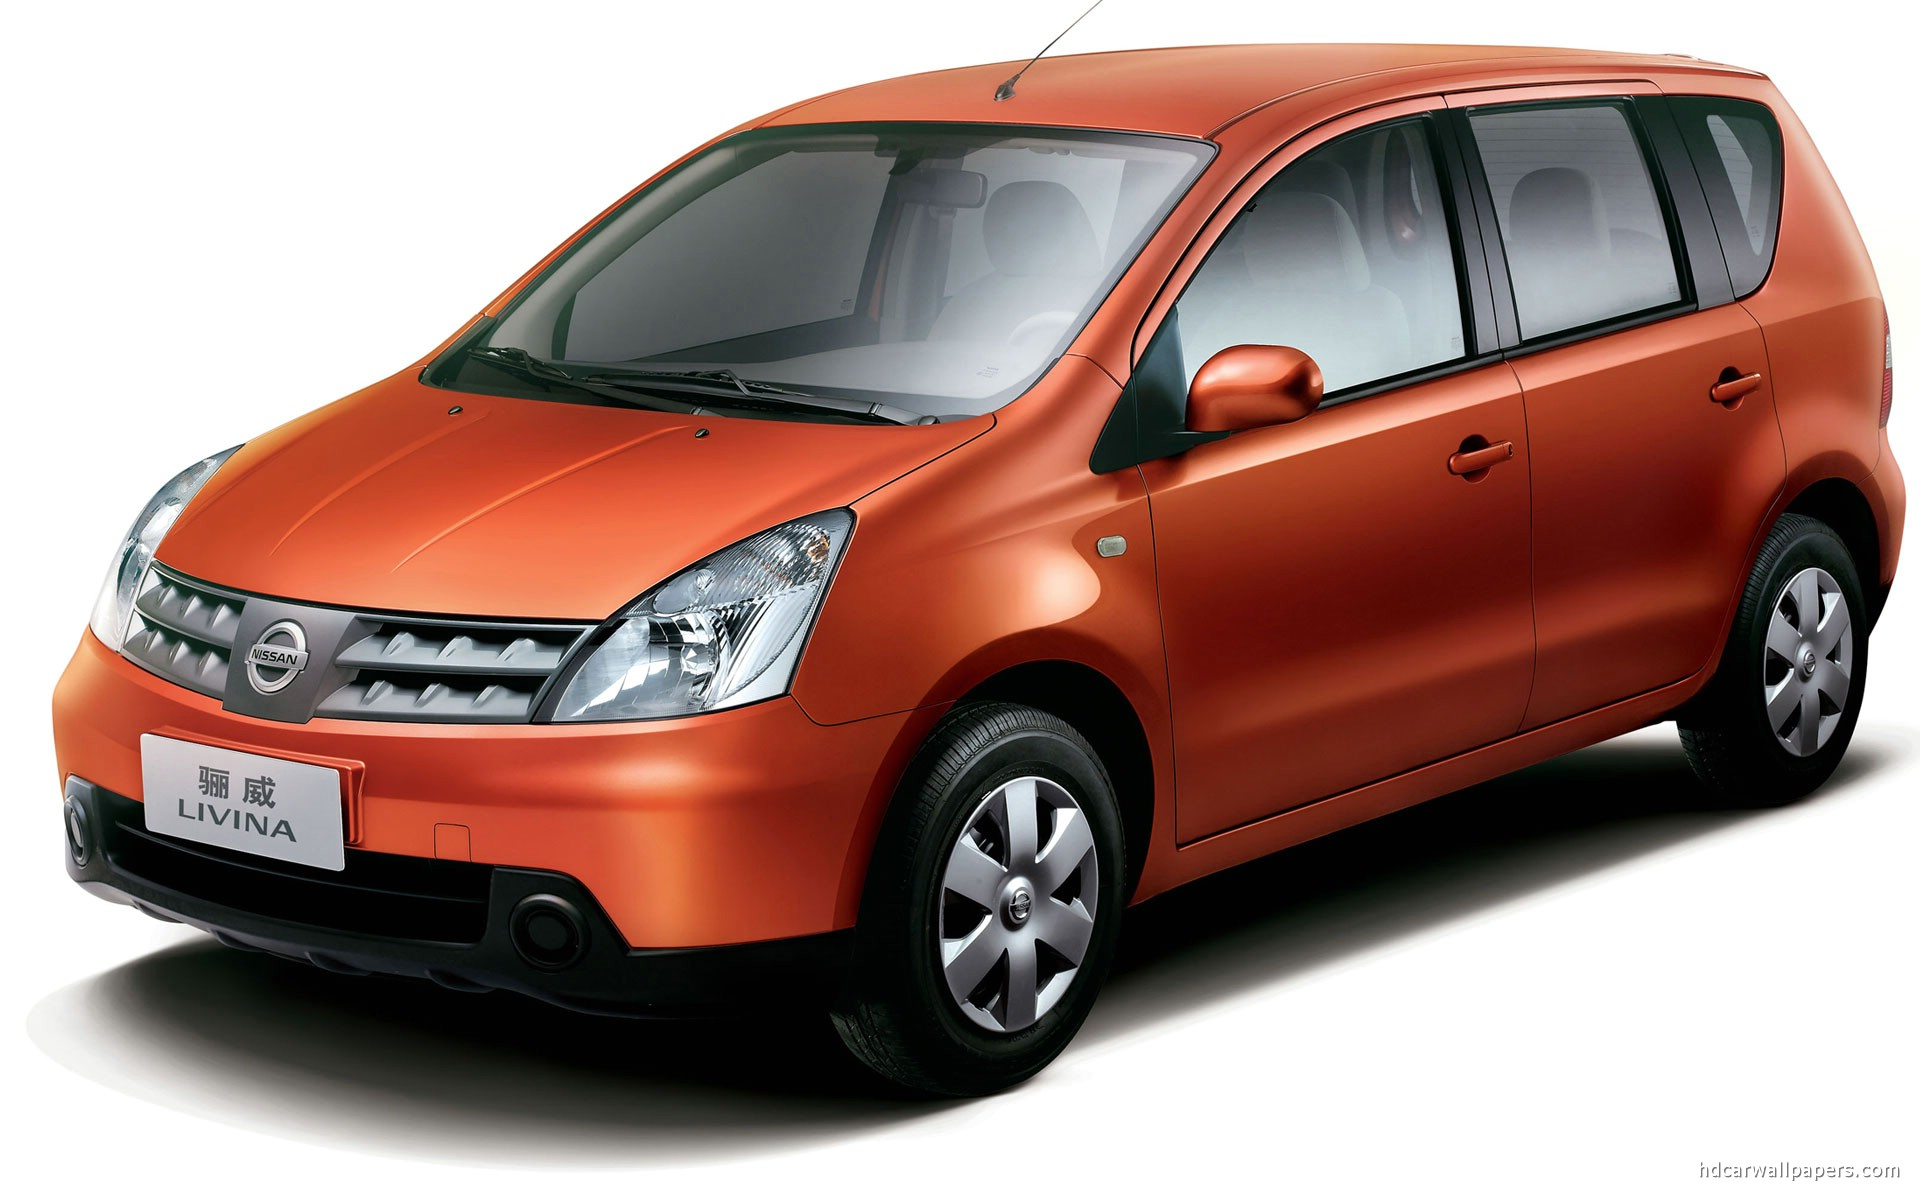 Nissan Livina Wallpaper | HD Car Wallpapers | ID #1320